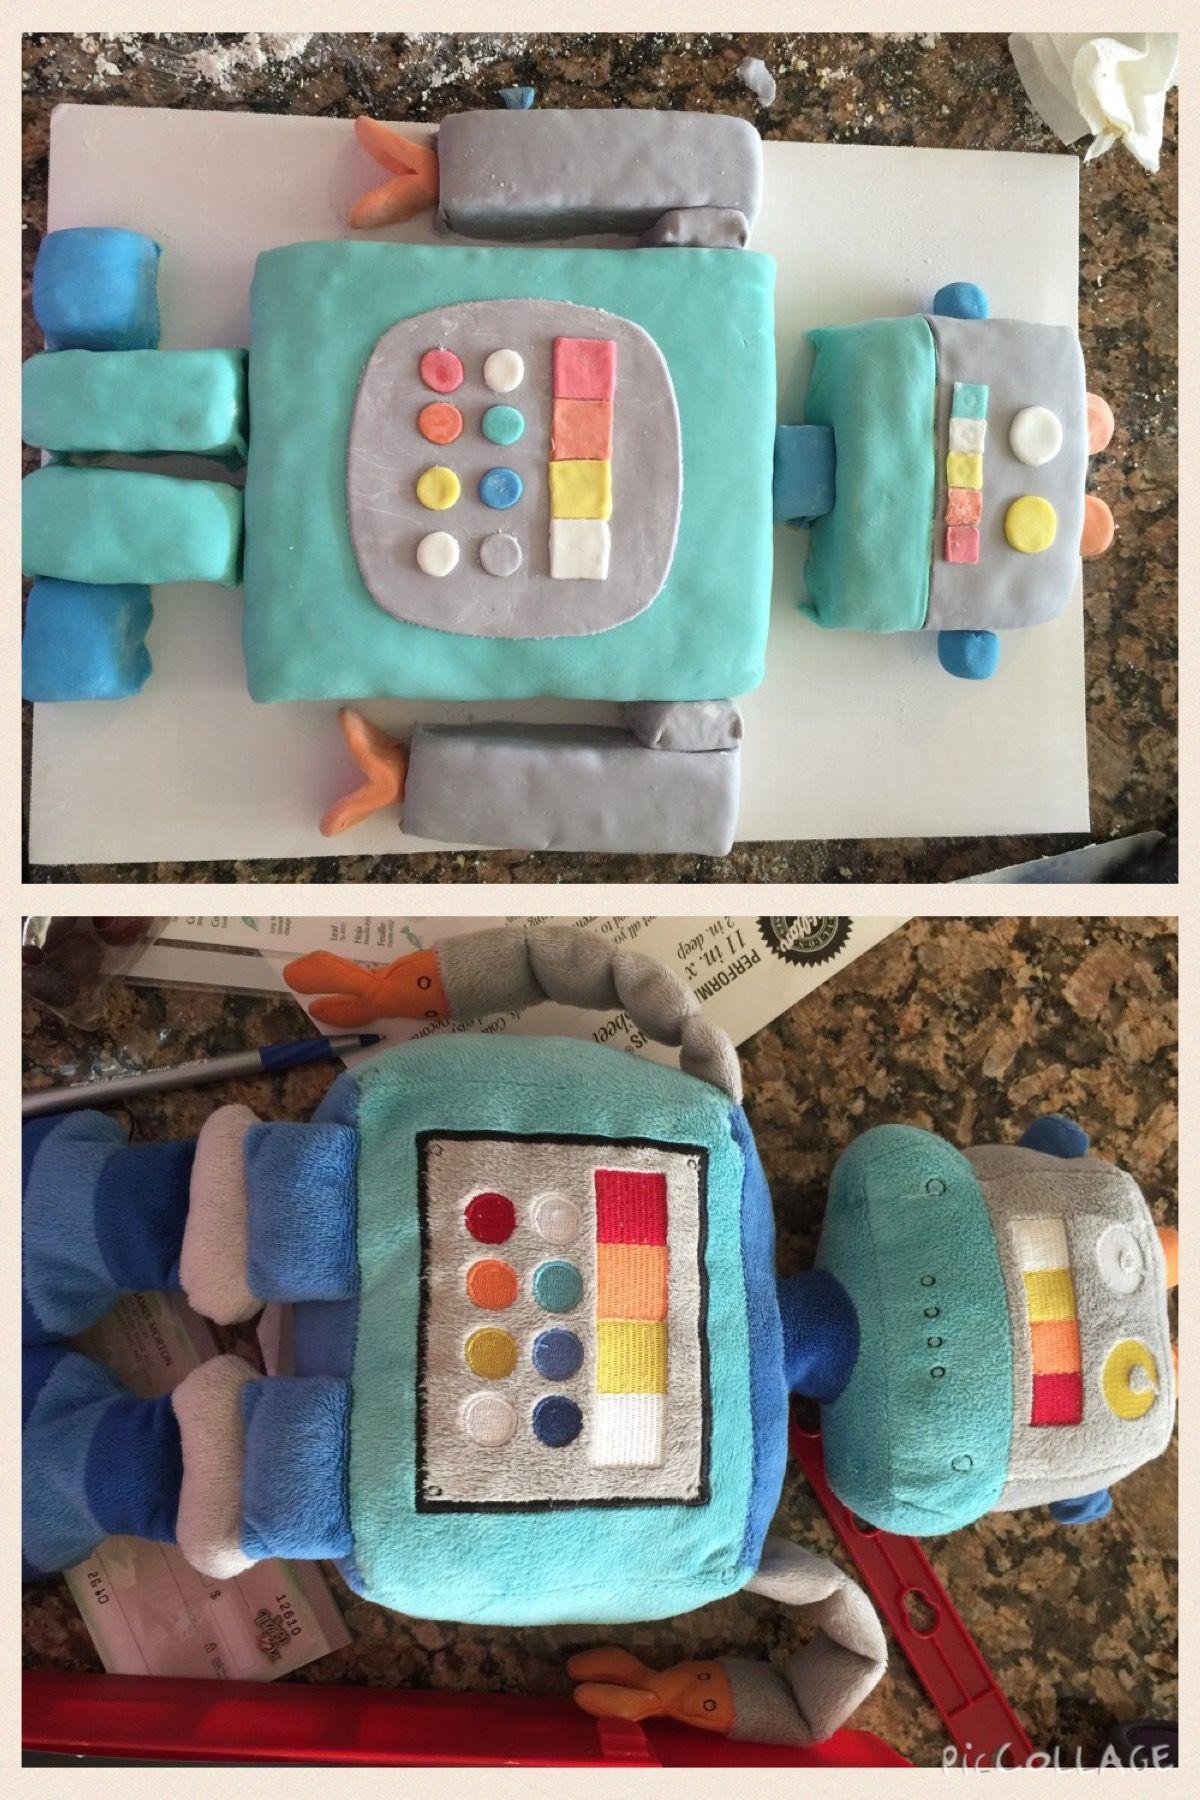 Owen's 4th birthday Robot cake.